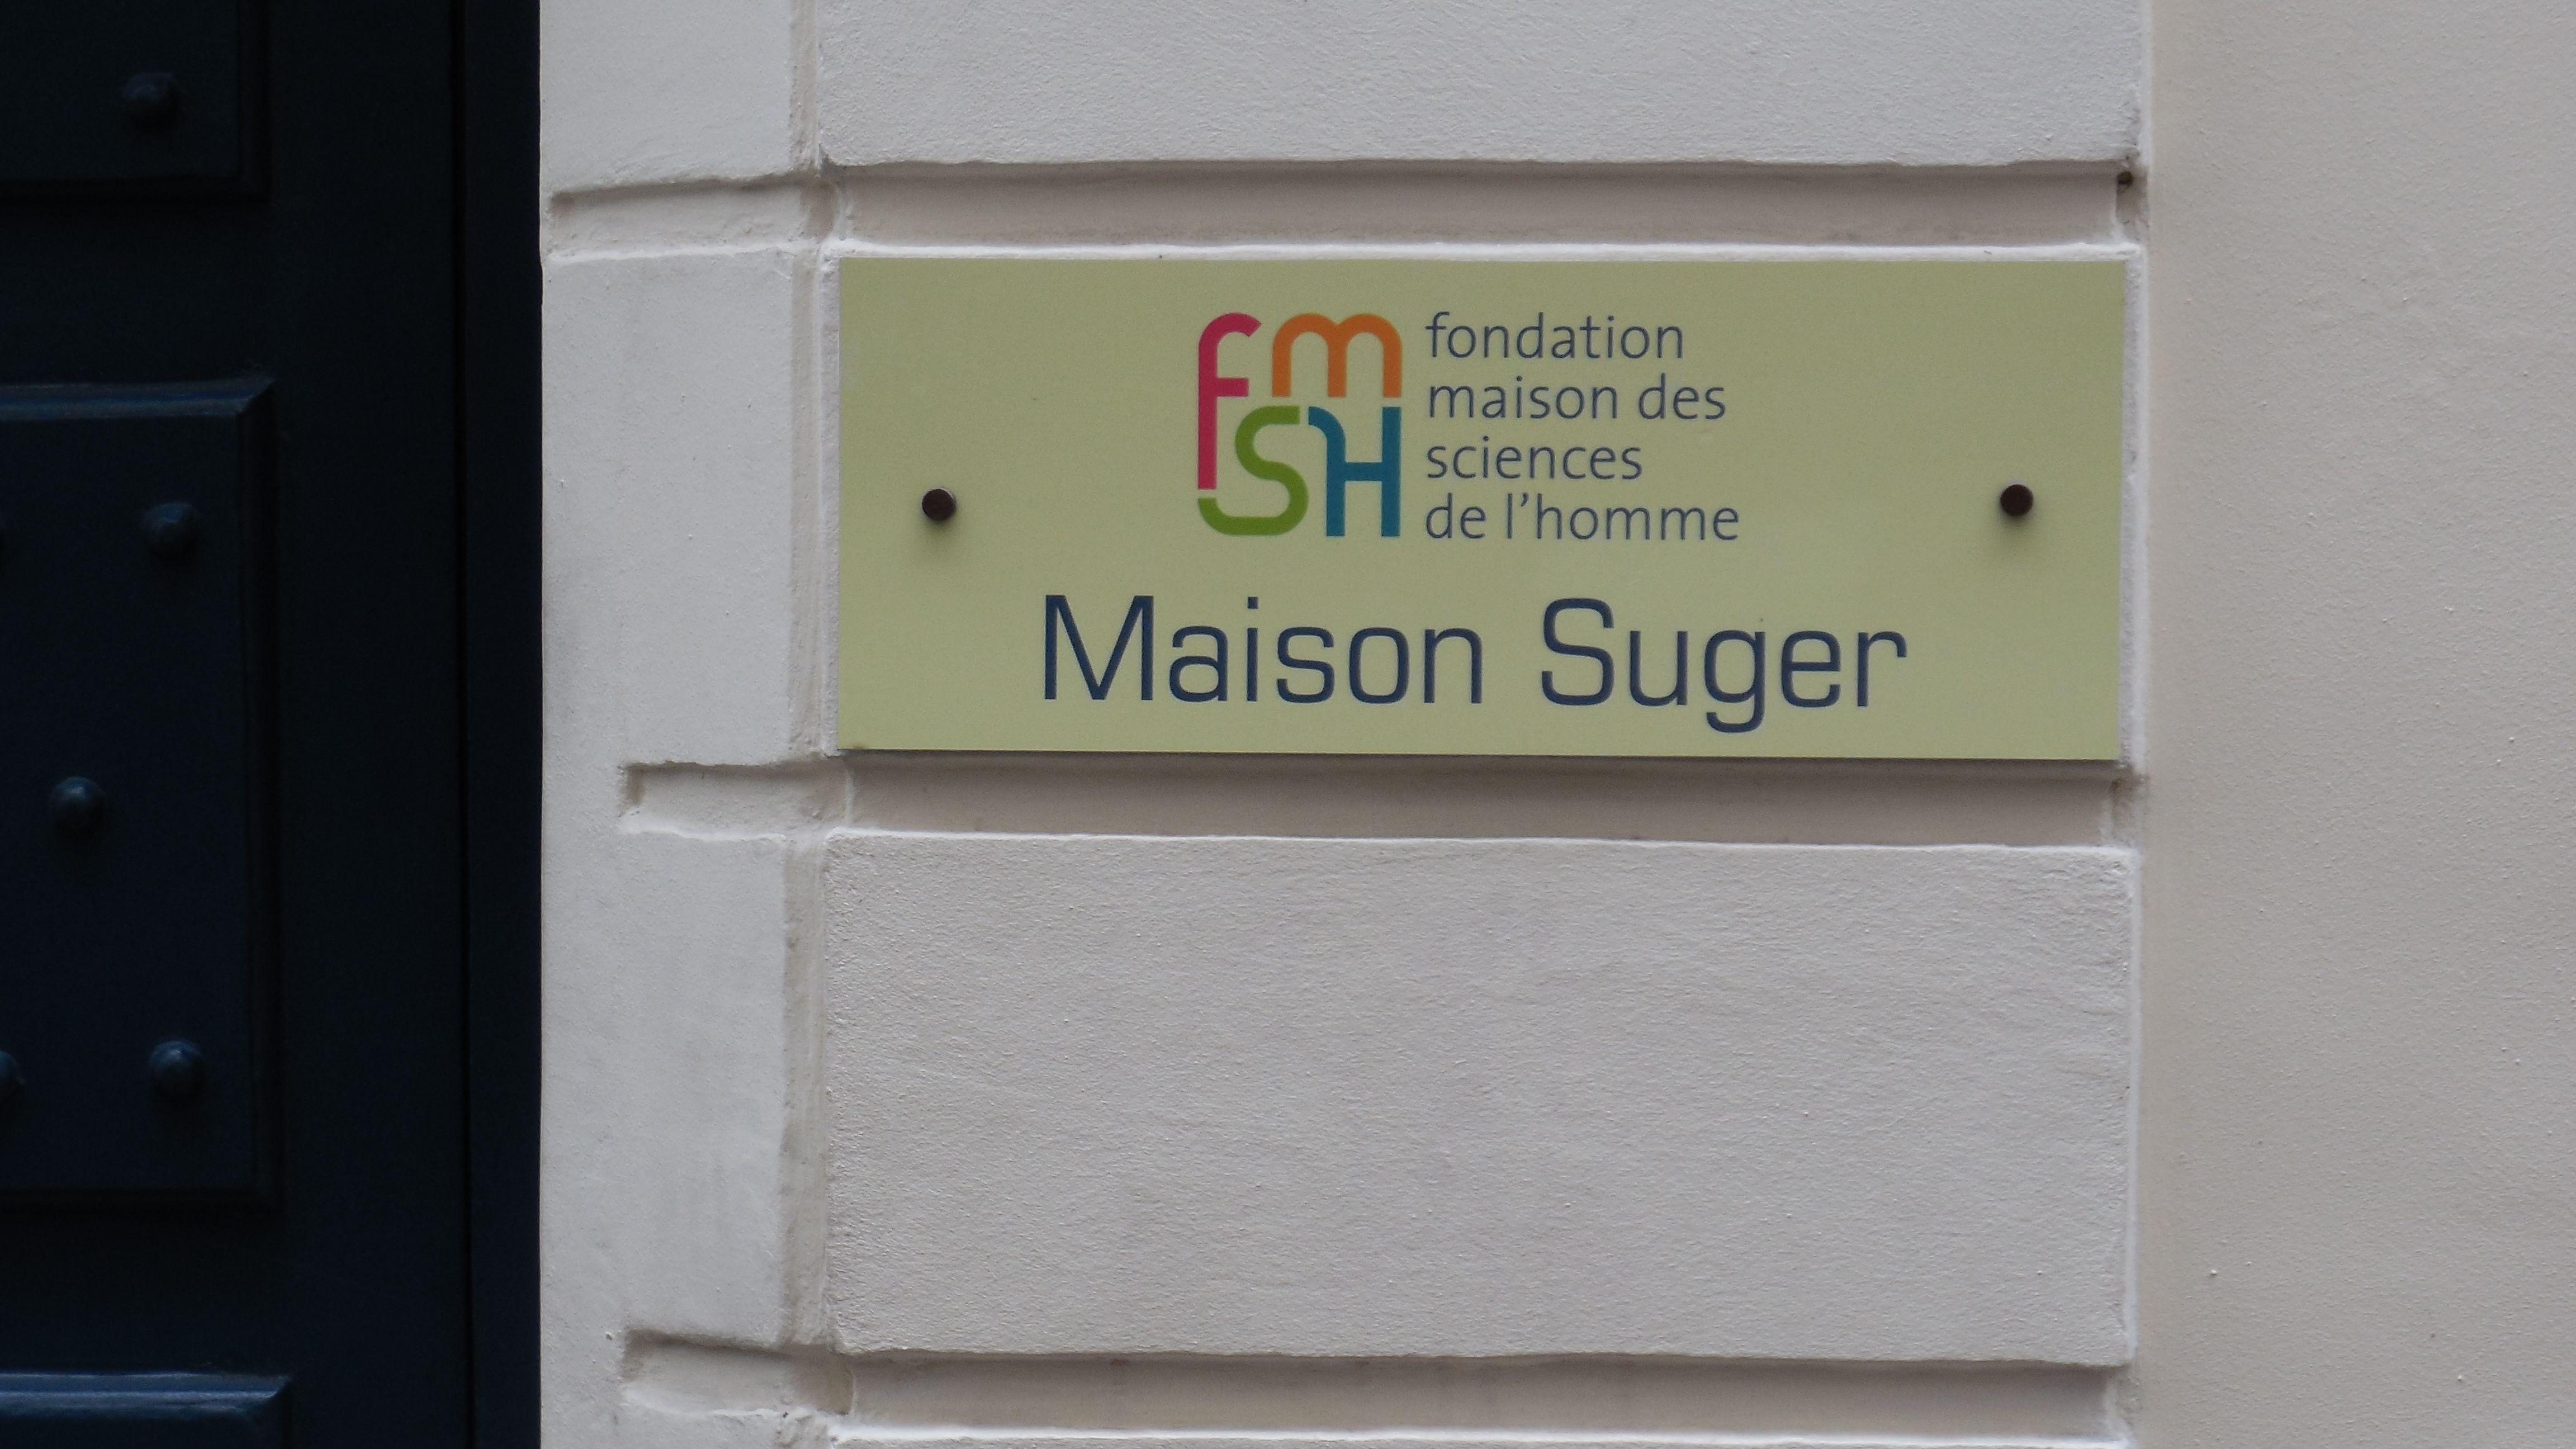 Fondation maison gendarmerie affordable with fondation for Fondation de la maison